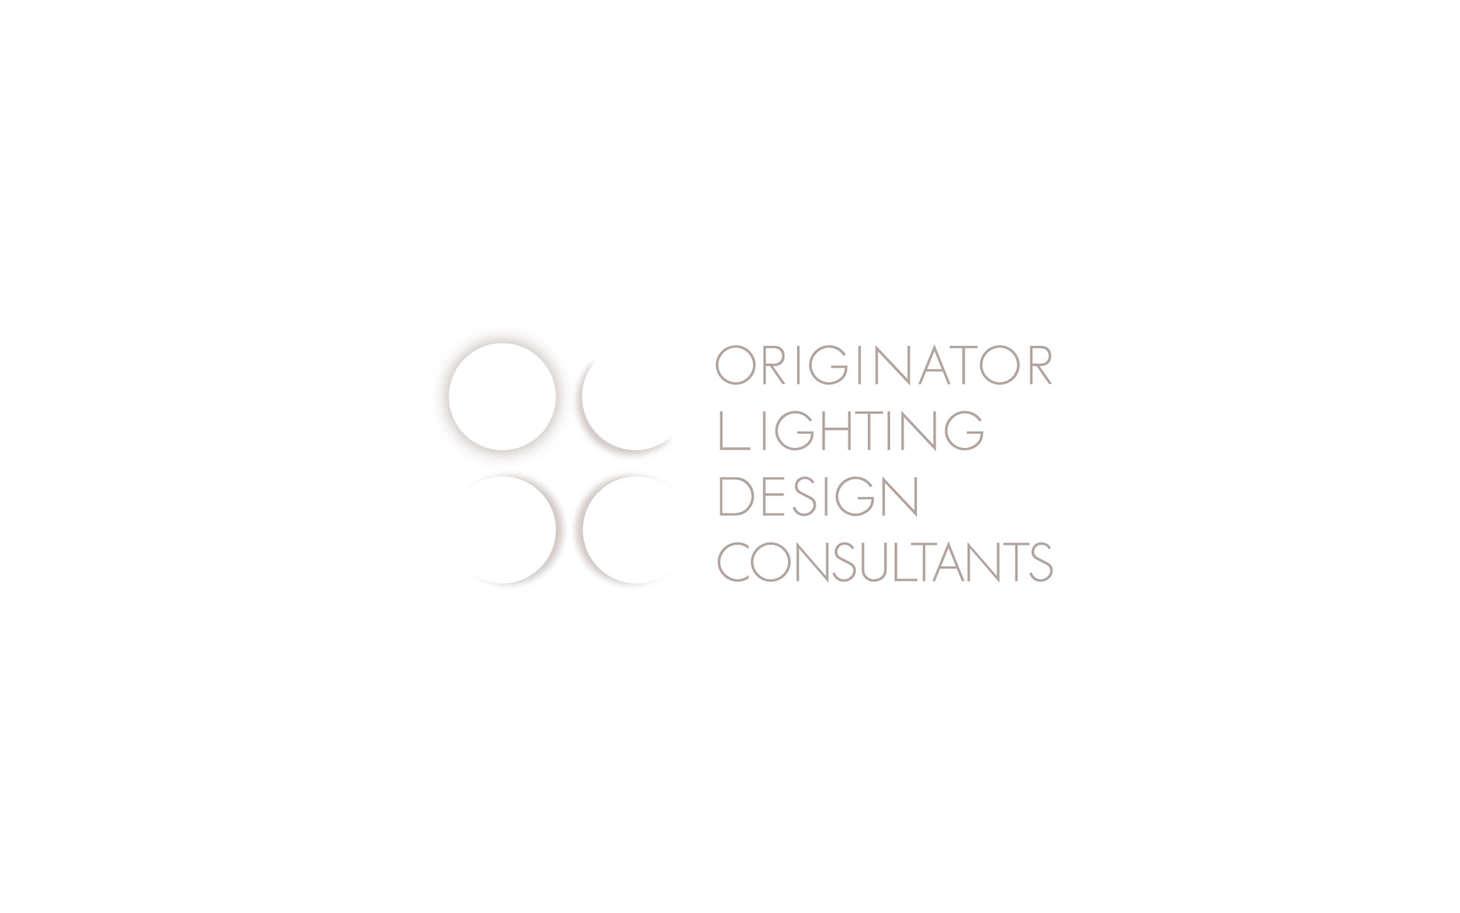 OLDC_Logo_01.jpg